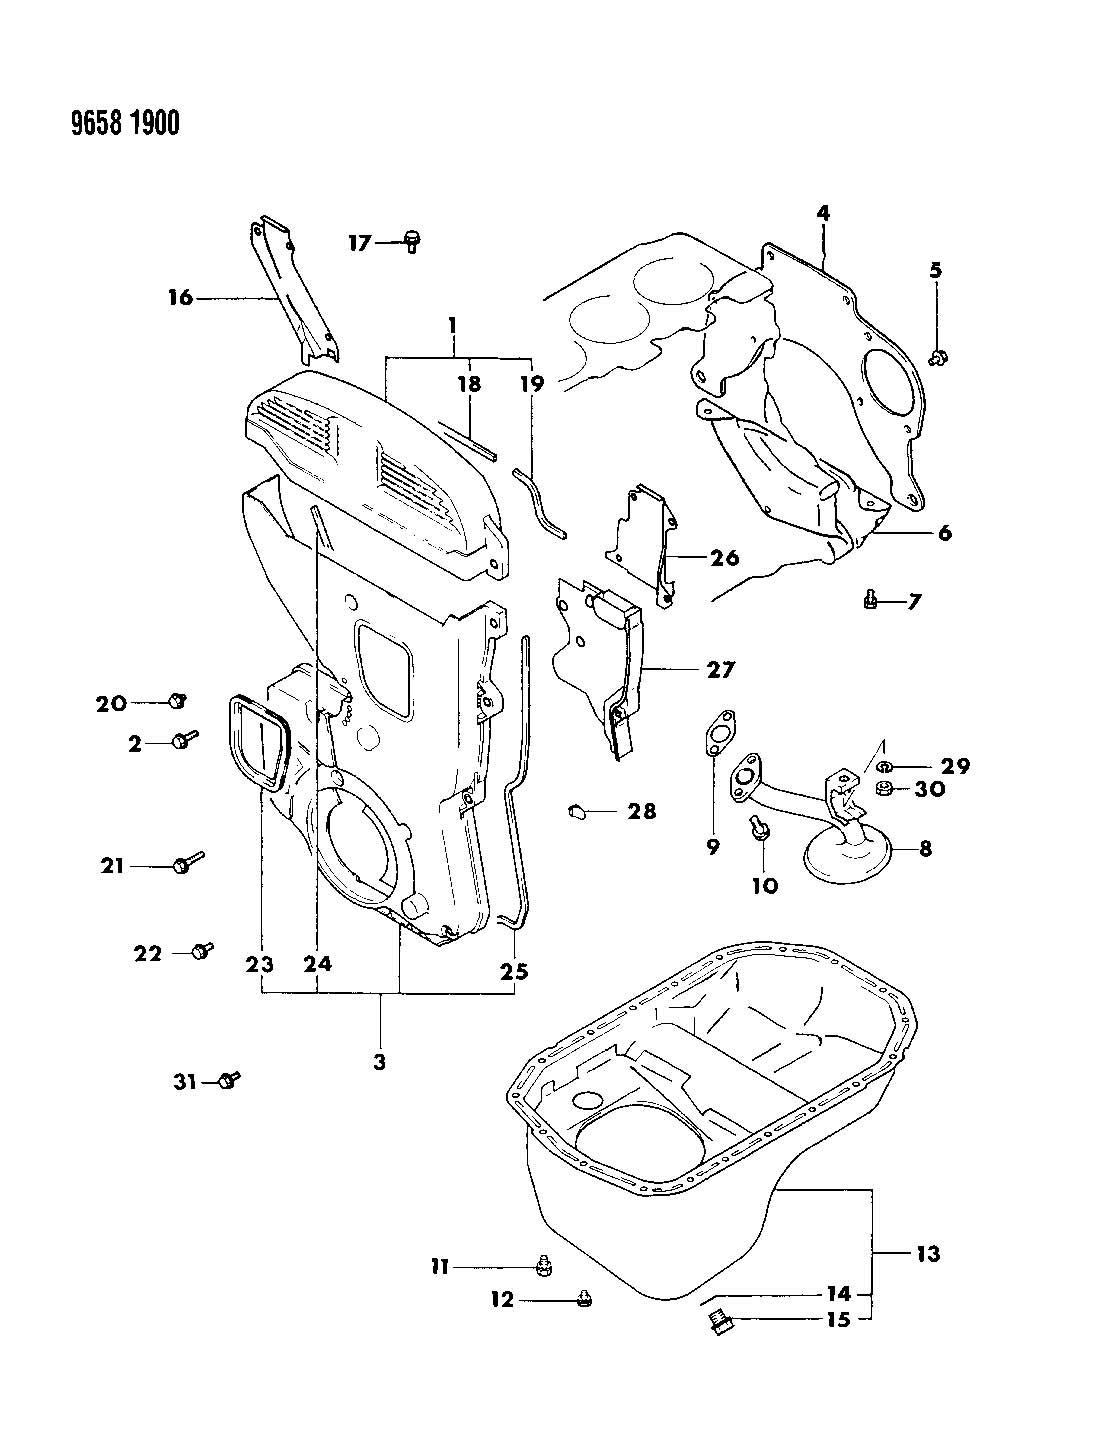 2011 mitsubishi galant fuse box diagram